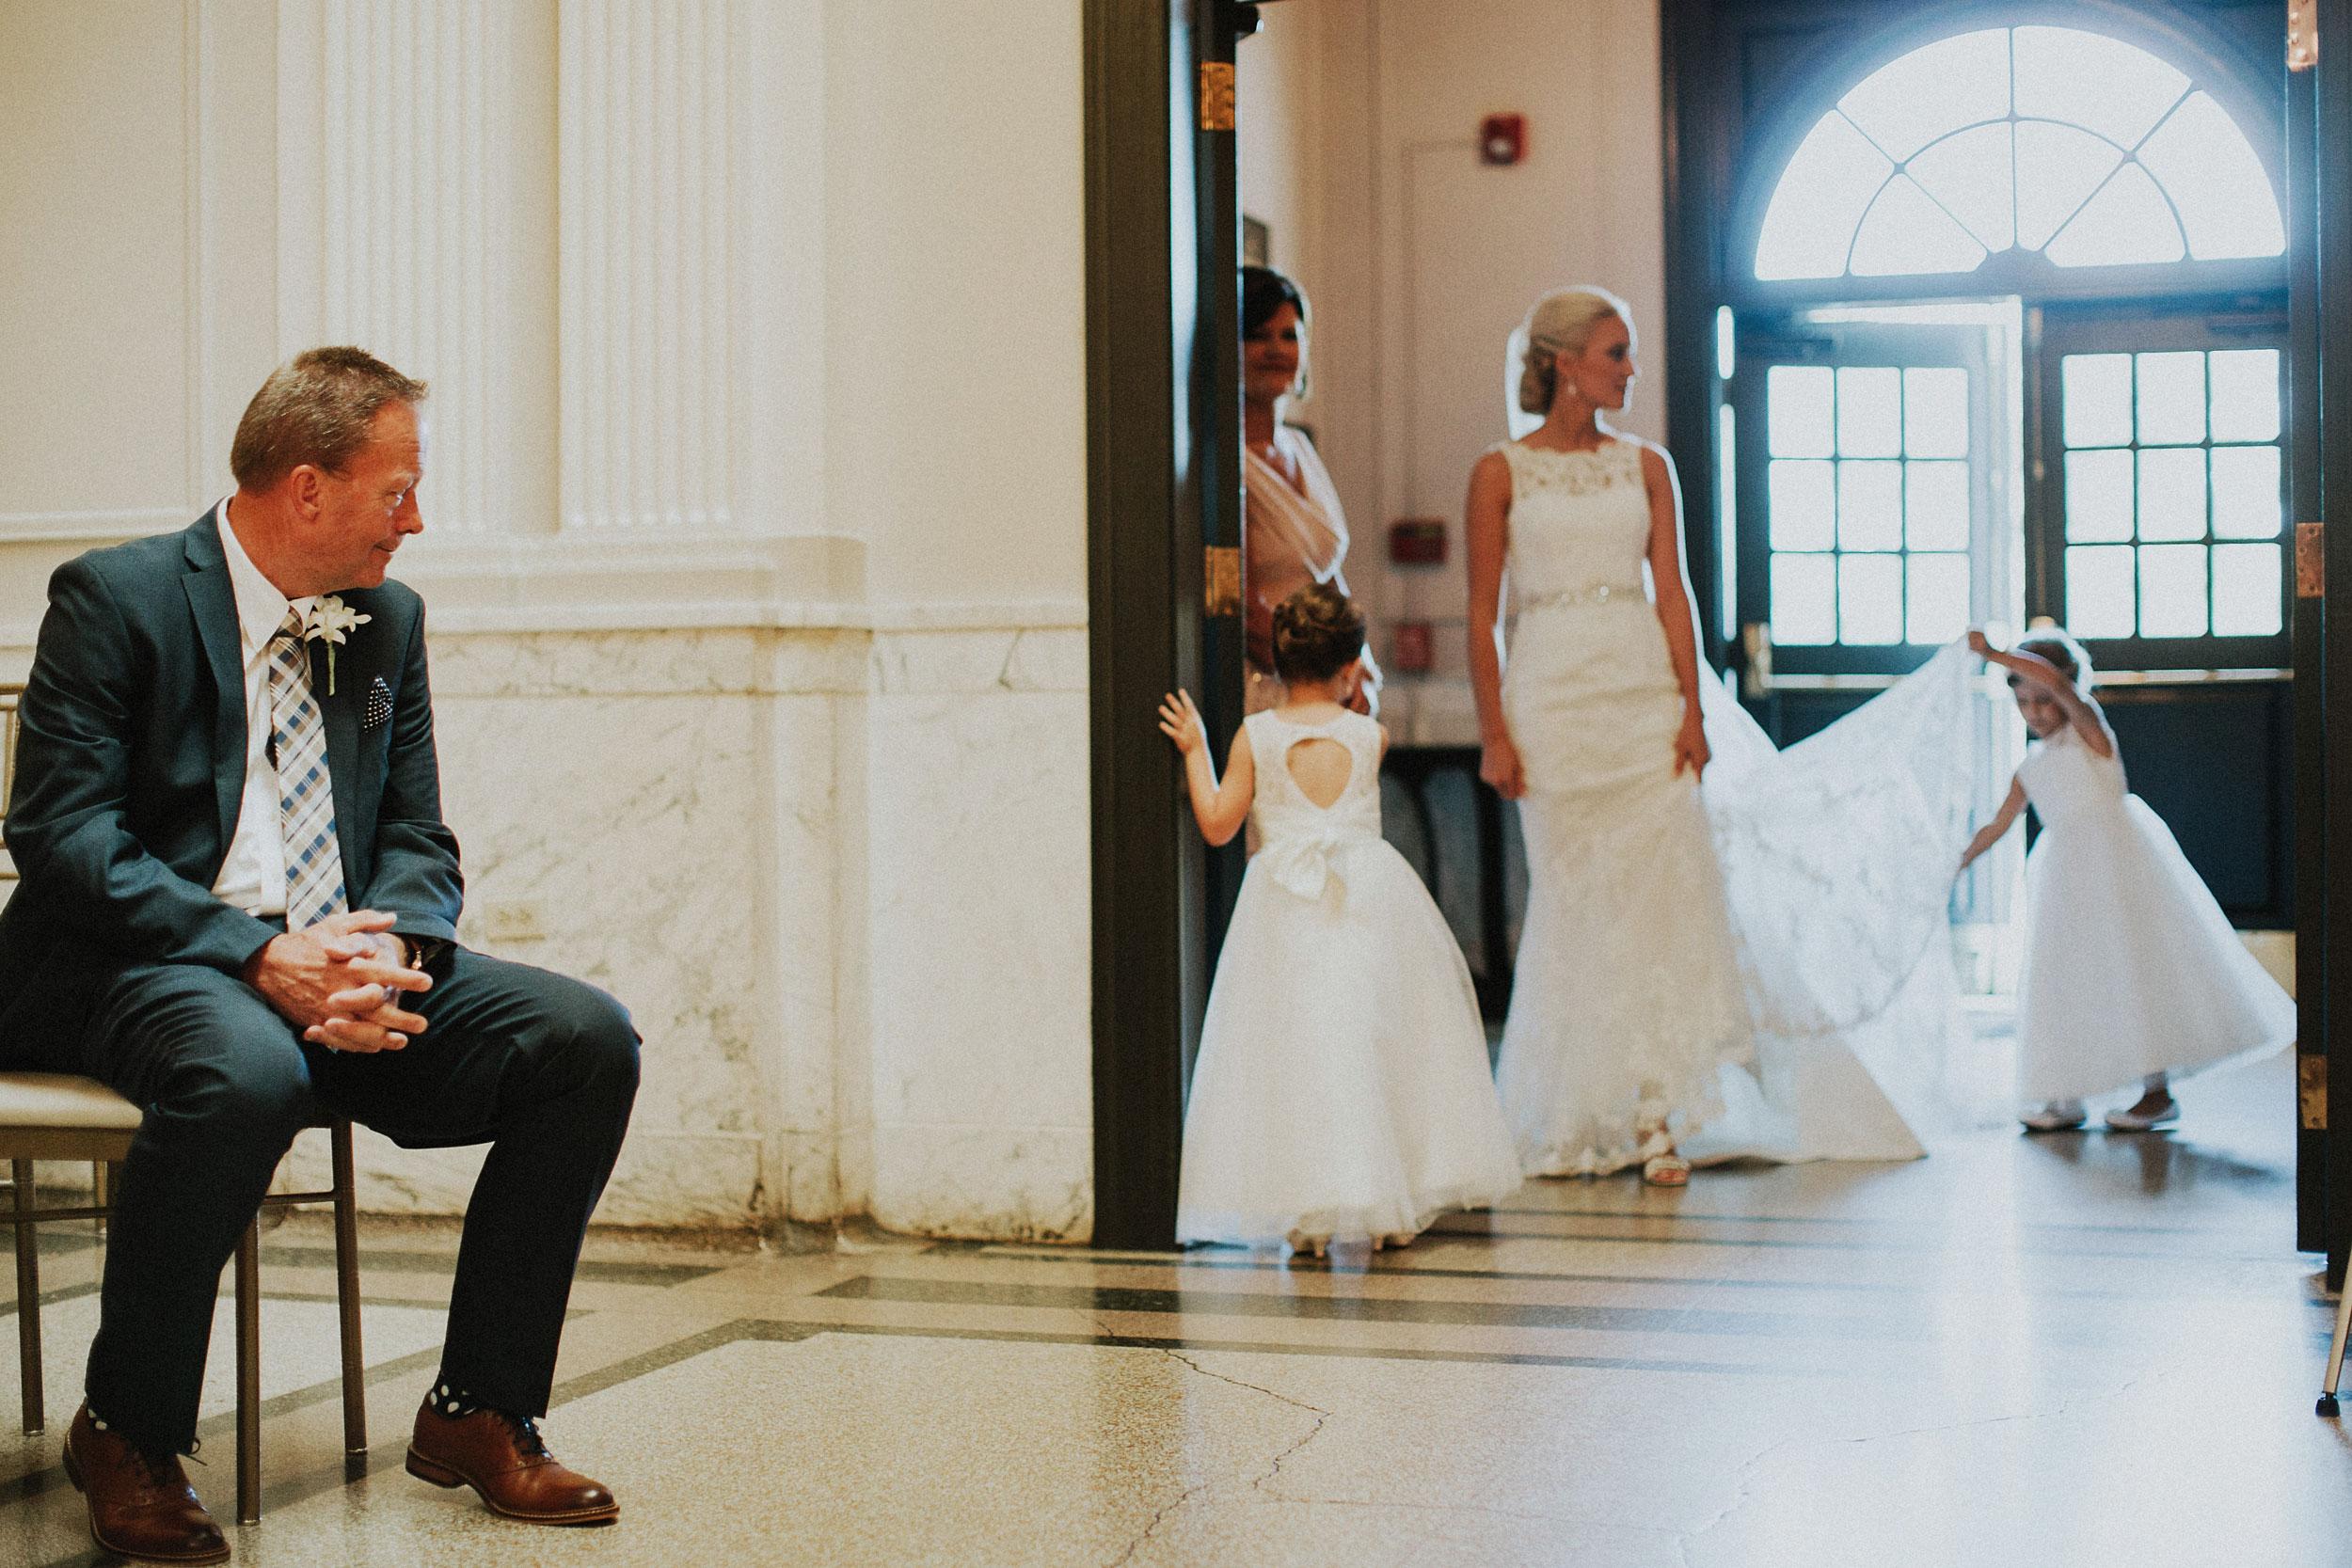 olmsted-wedding-louisville-kentucky-018.JPG